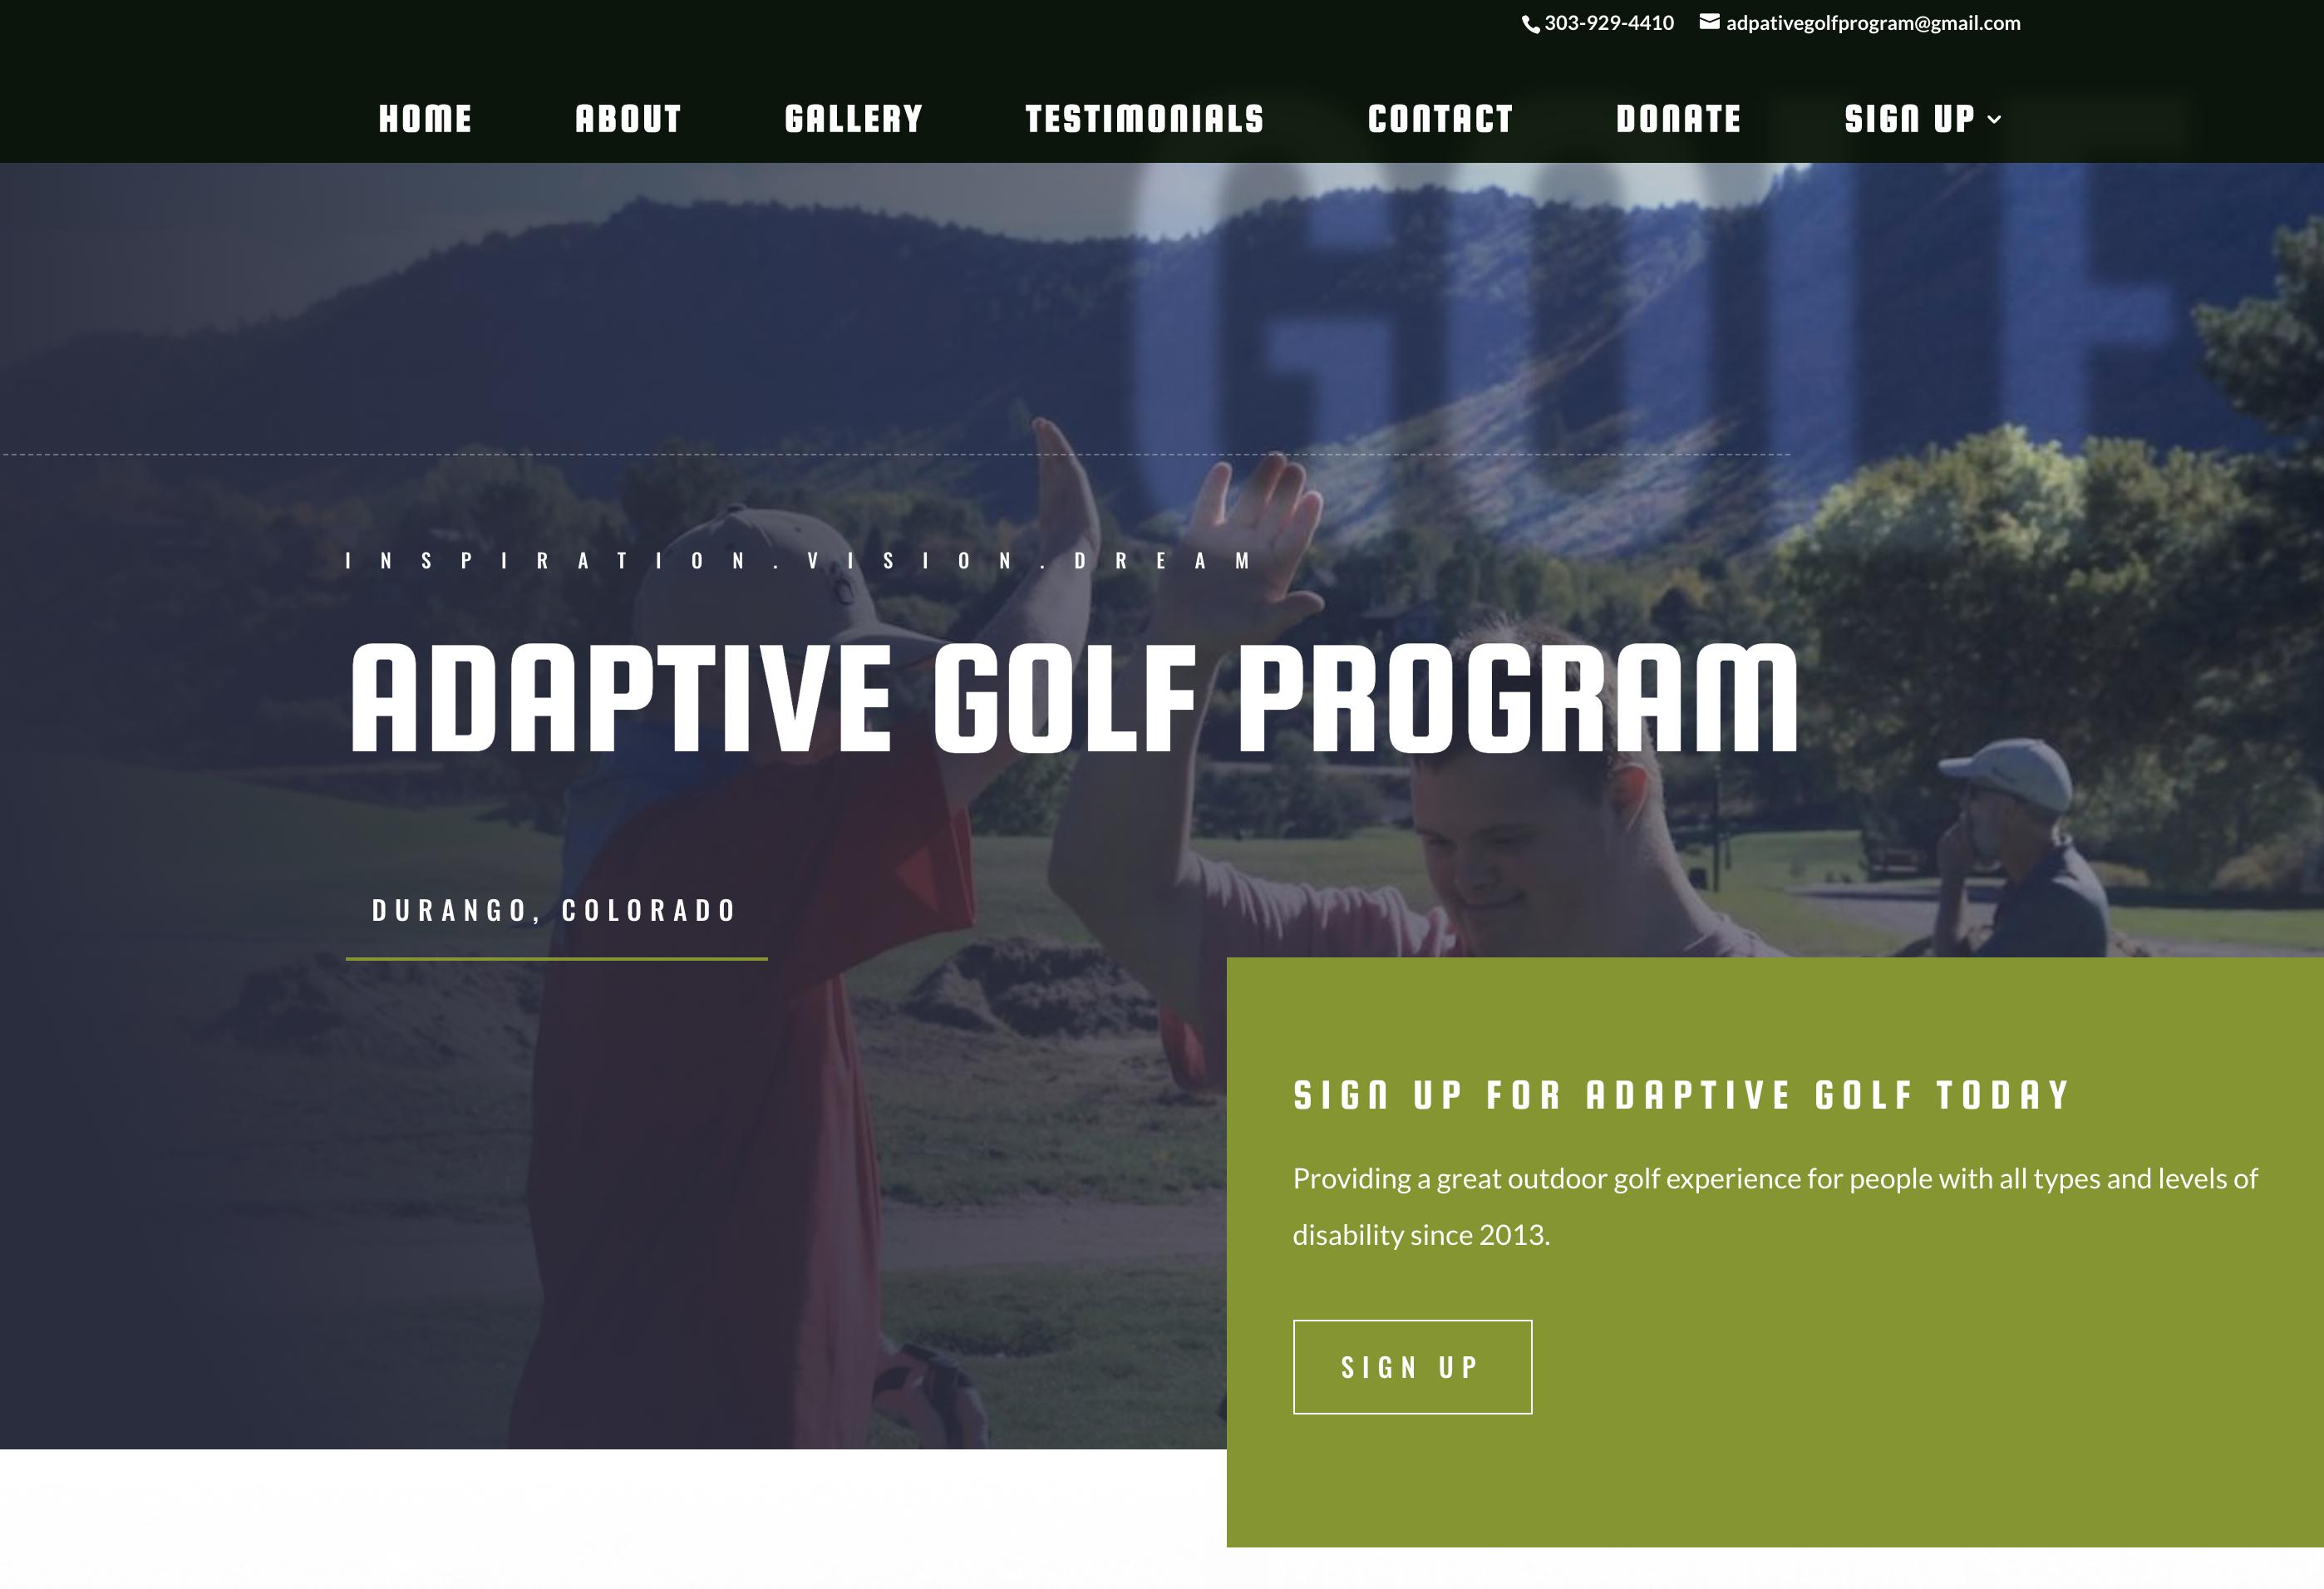 Adaptive Golf Program